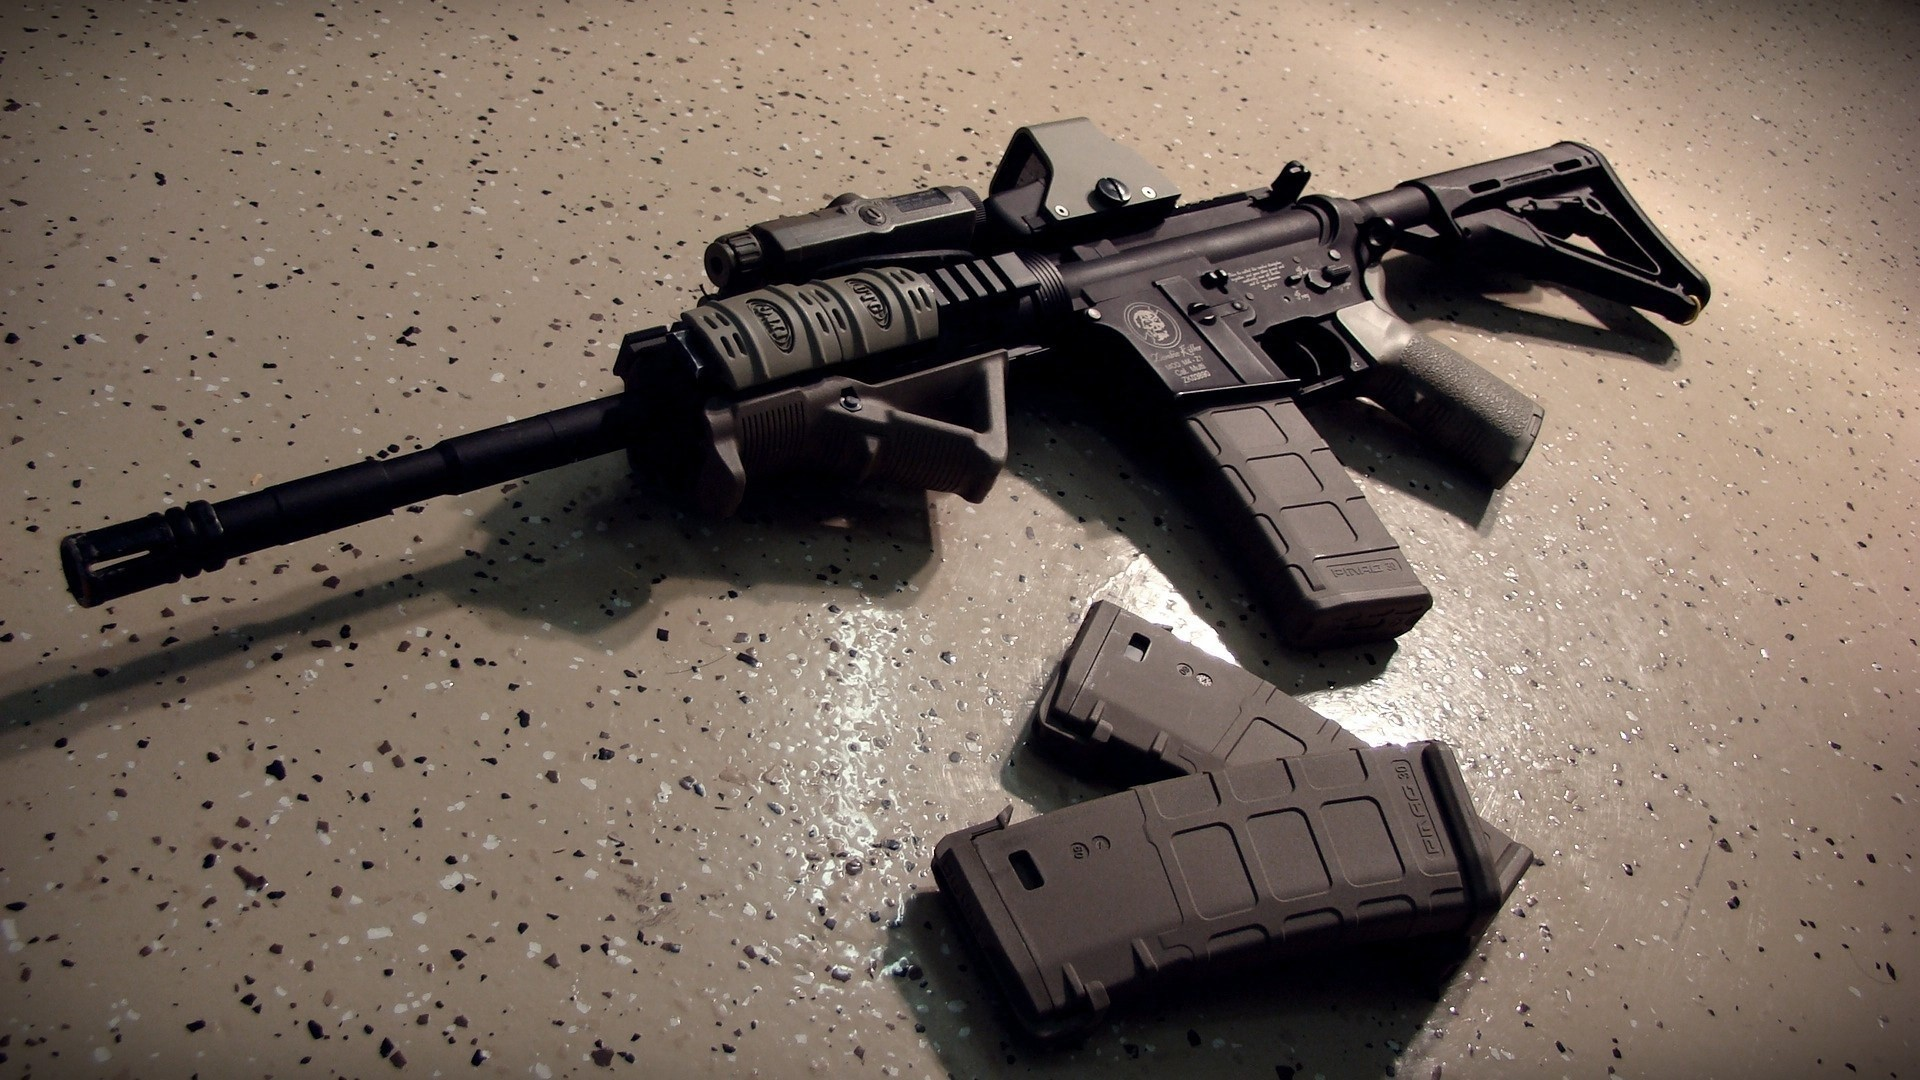 AK 47 Black Gun And Magazine HD Image Background